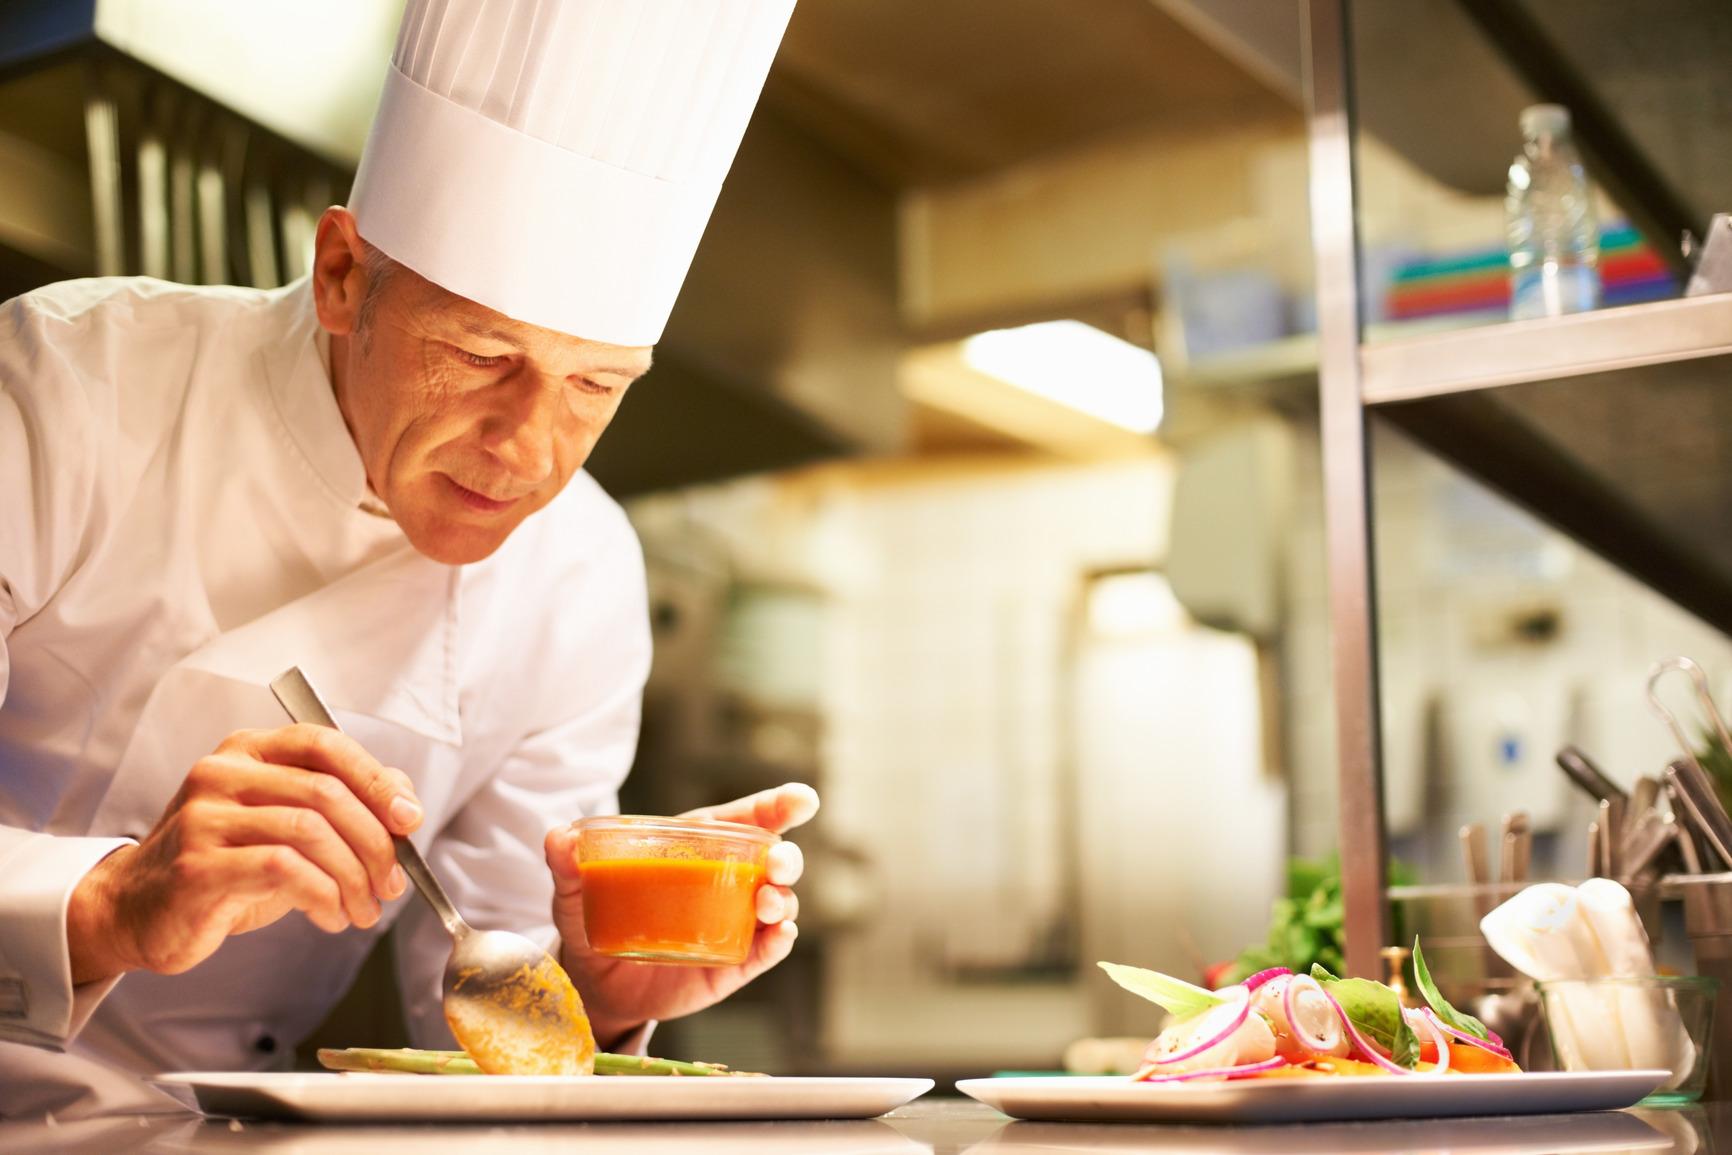 cercasi personale di cucina in provincia di brescia